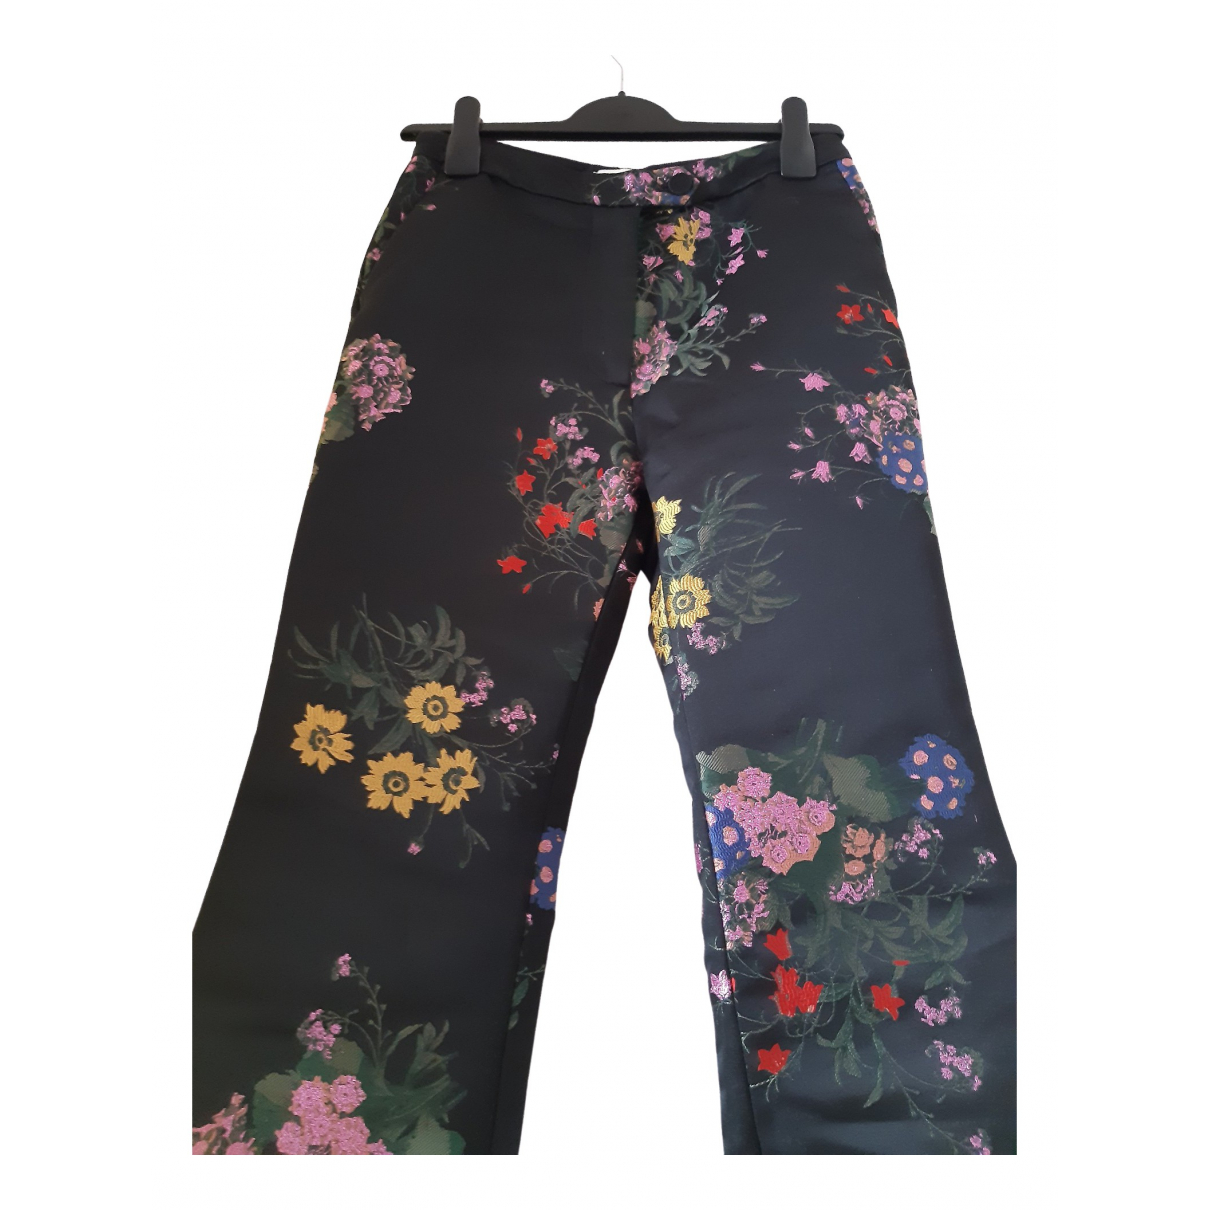 Pantalon pitillo Erdem X H&m